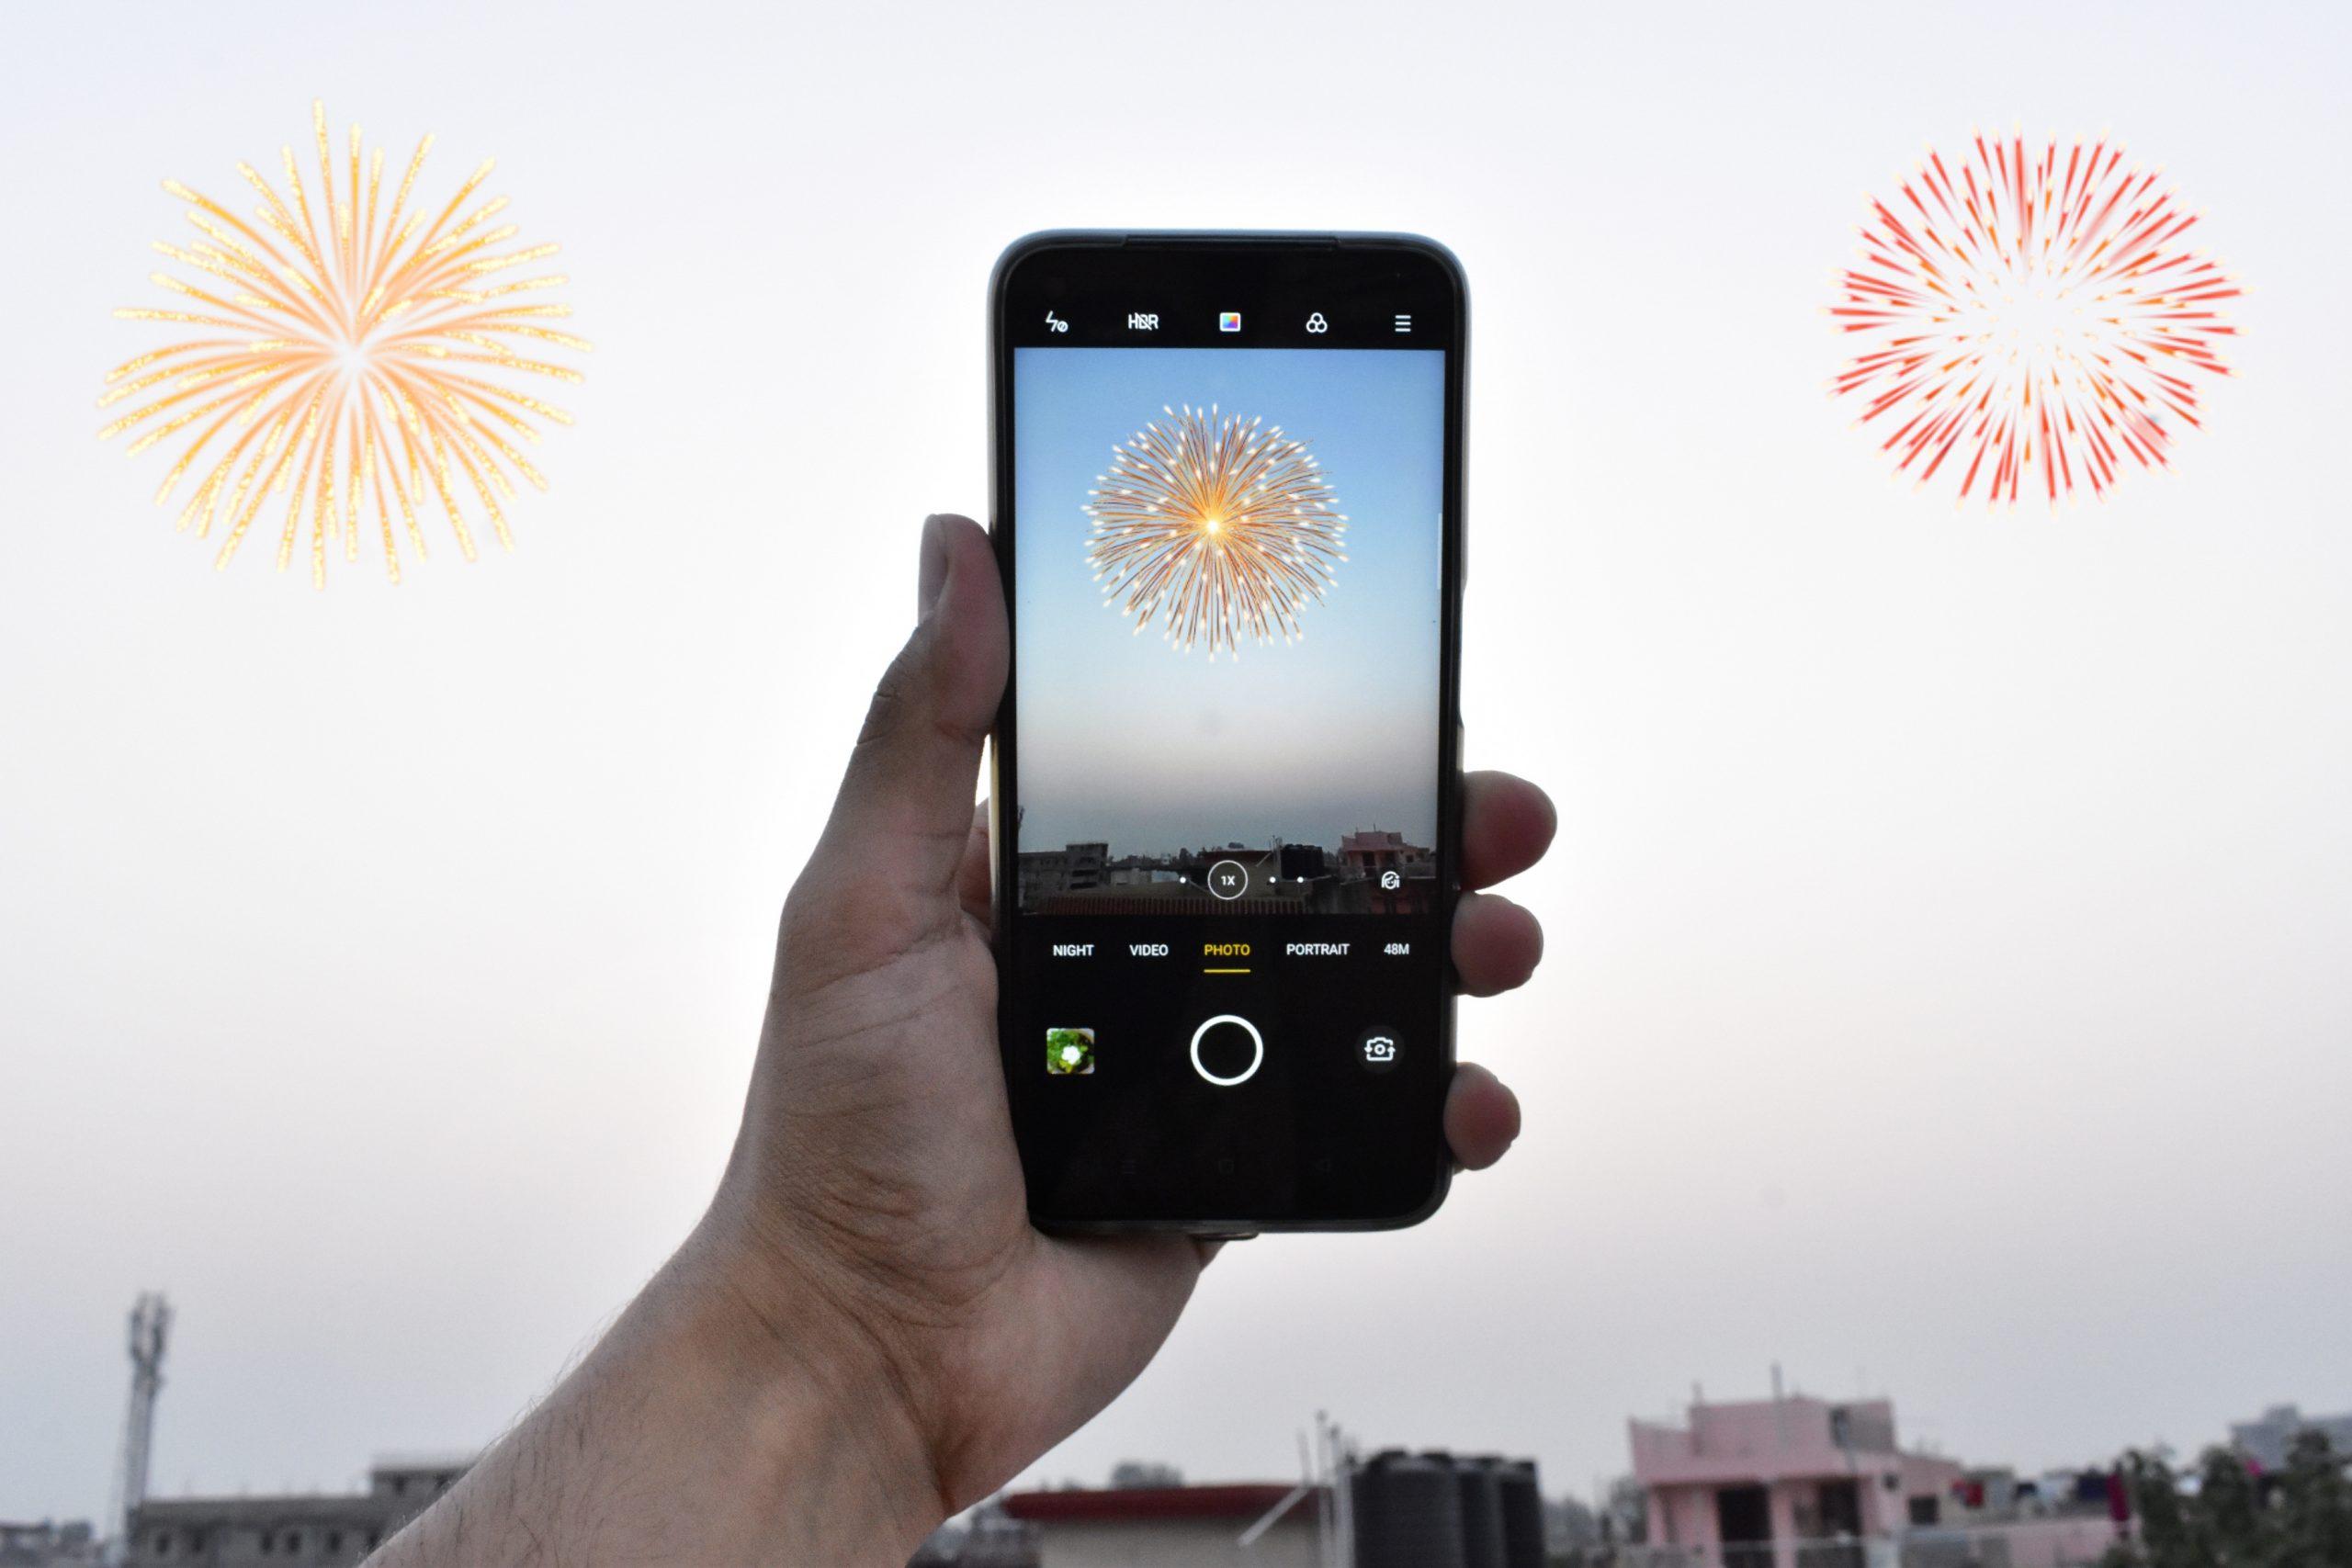 Capturing Diwali Crackers in camera